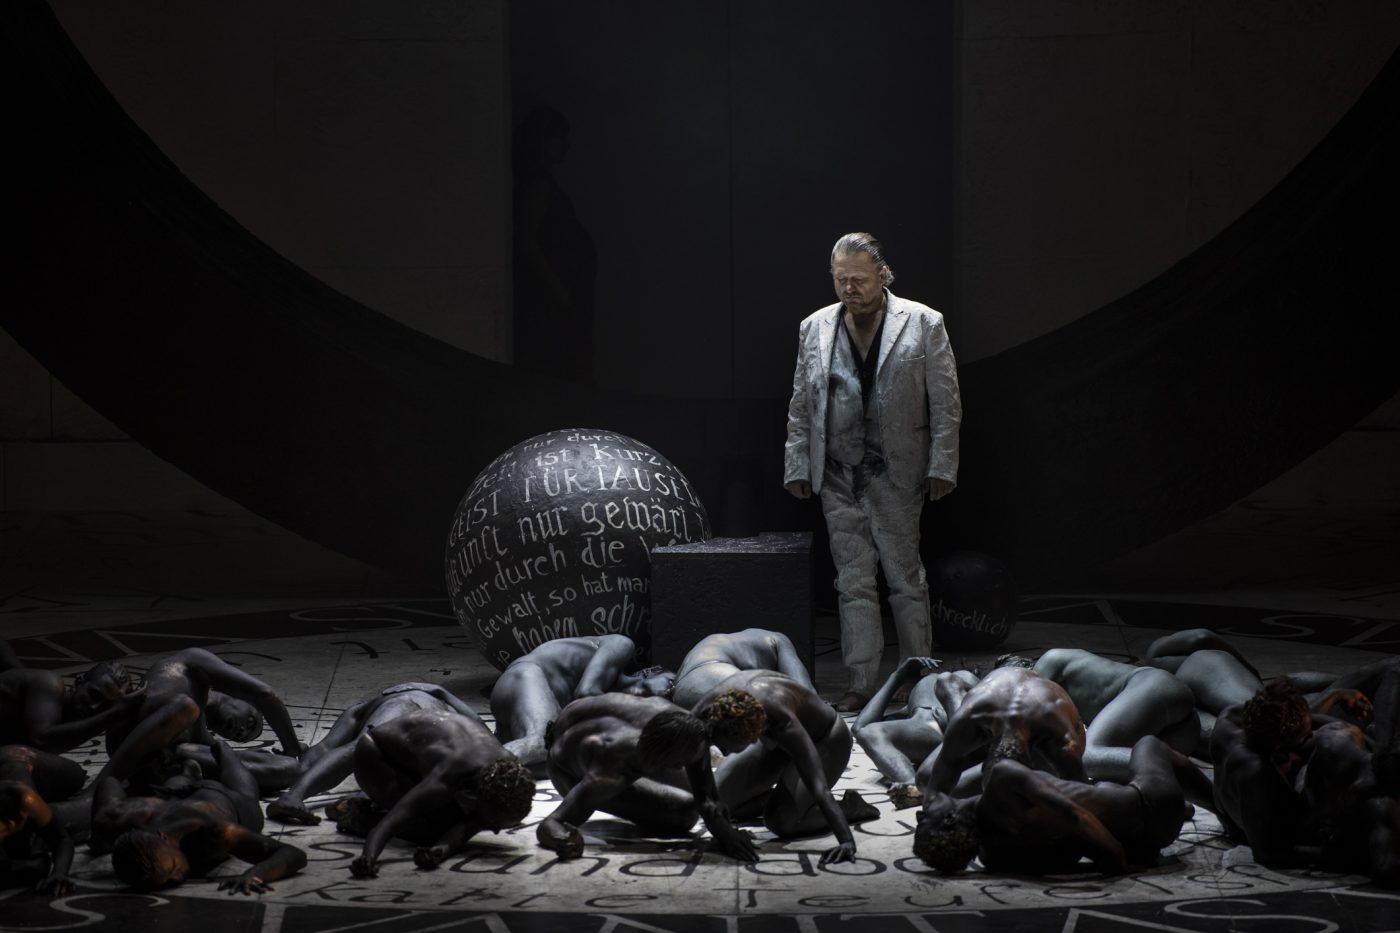 Kamil Ben Hsaïn Lachiri,  de Faust